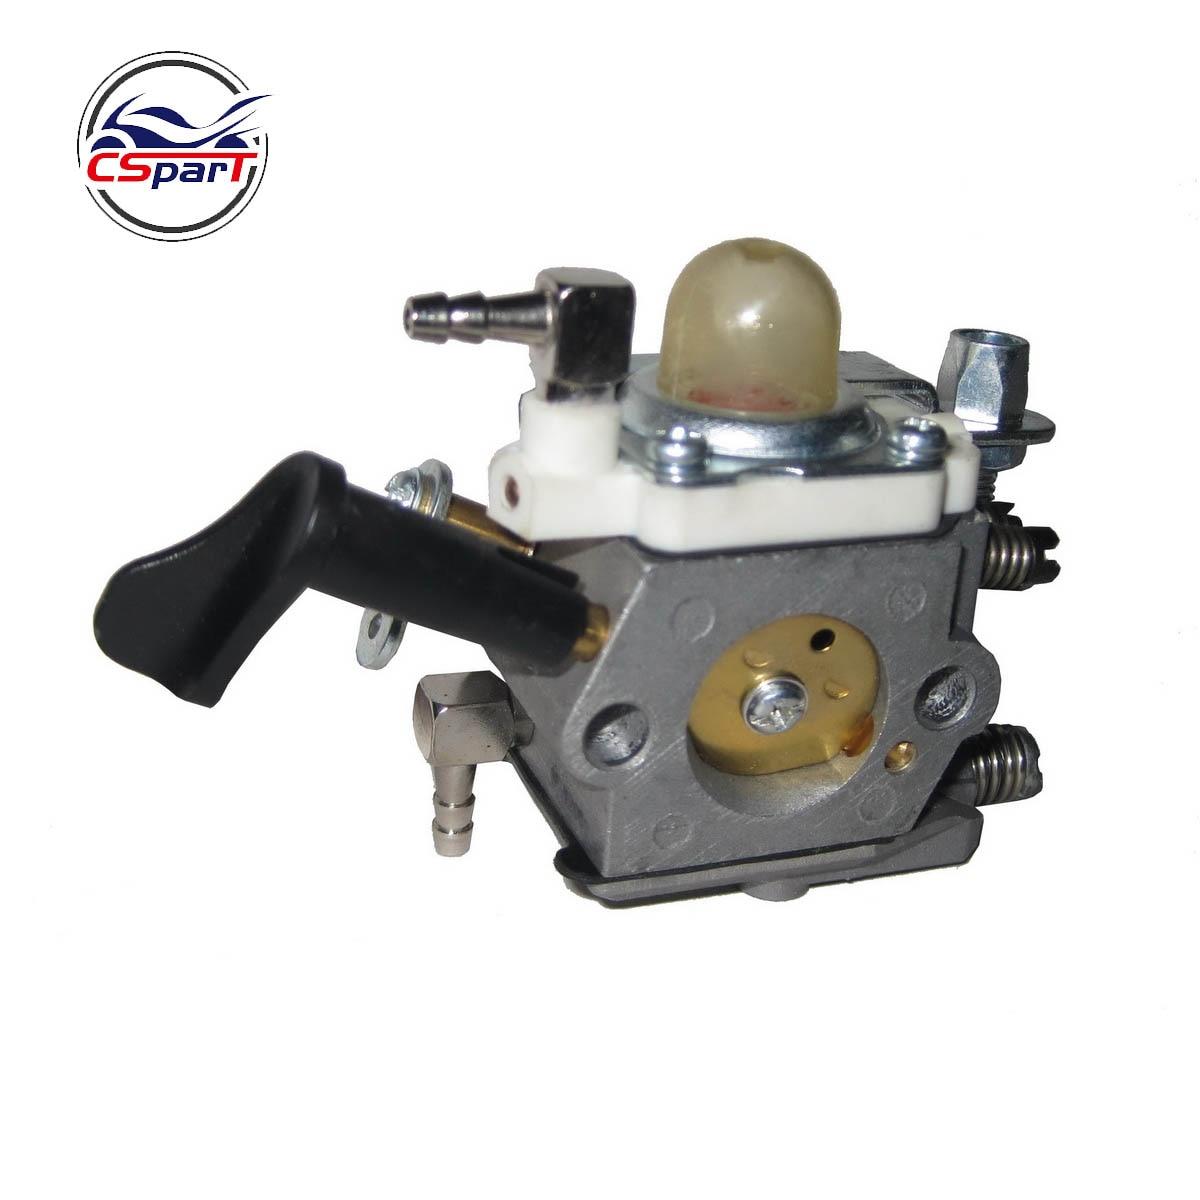 Carburateur Standard pour 47cc 49cc Mini Moto Pocket Bike Dirt Cross ATV Quad PetrolScooter